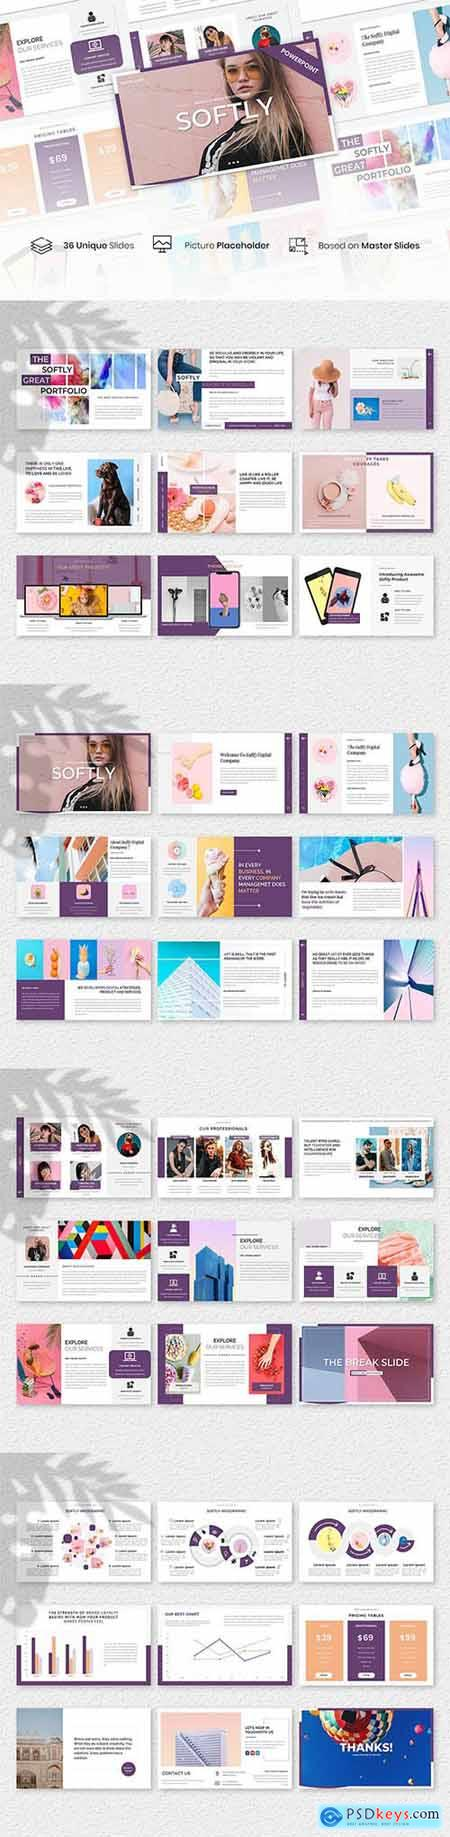 Softly – Creative Business Presentation Template